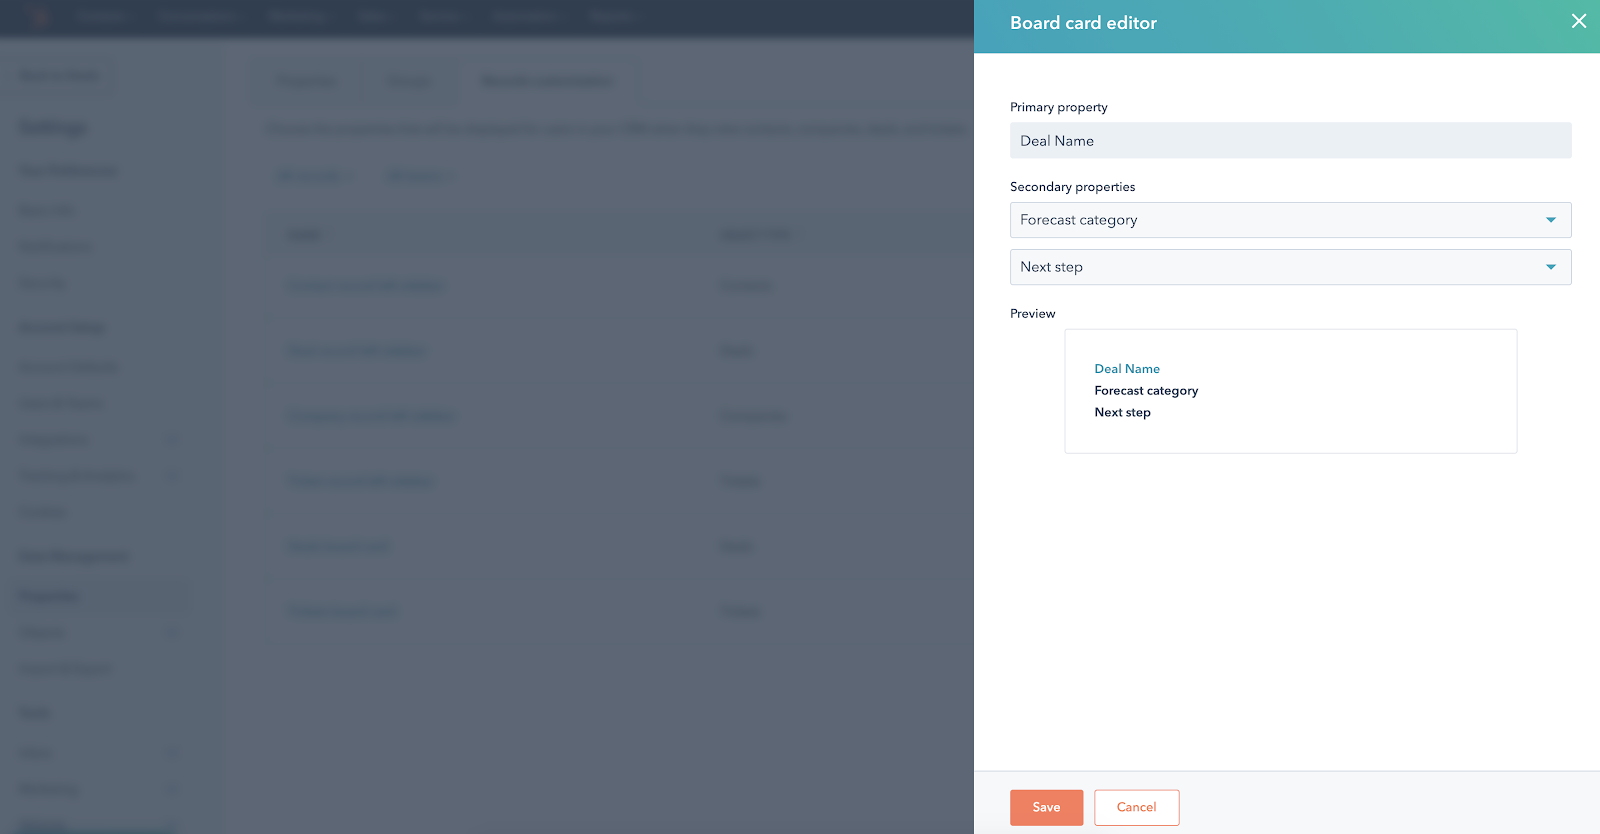 Screenshot of board card editor within HubSpot